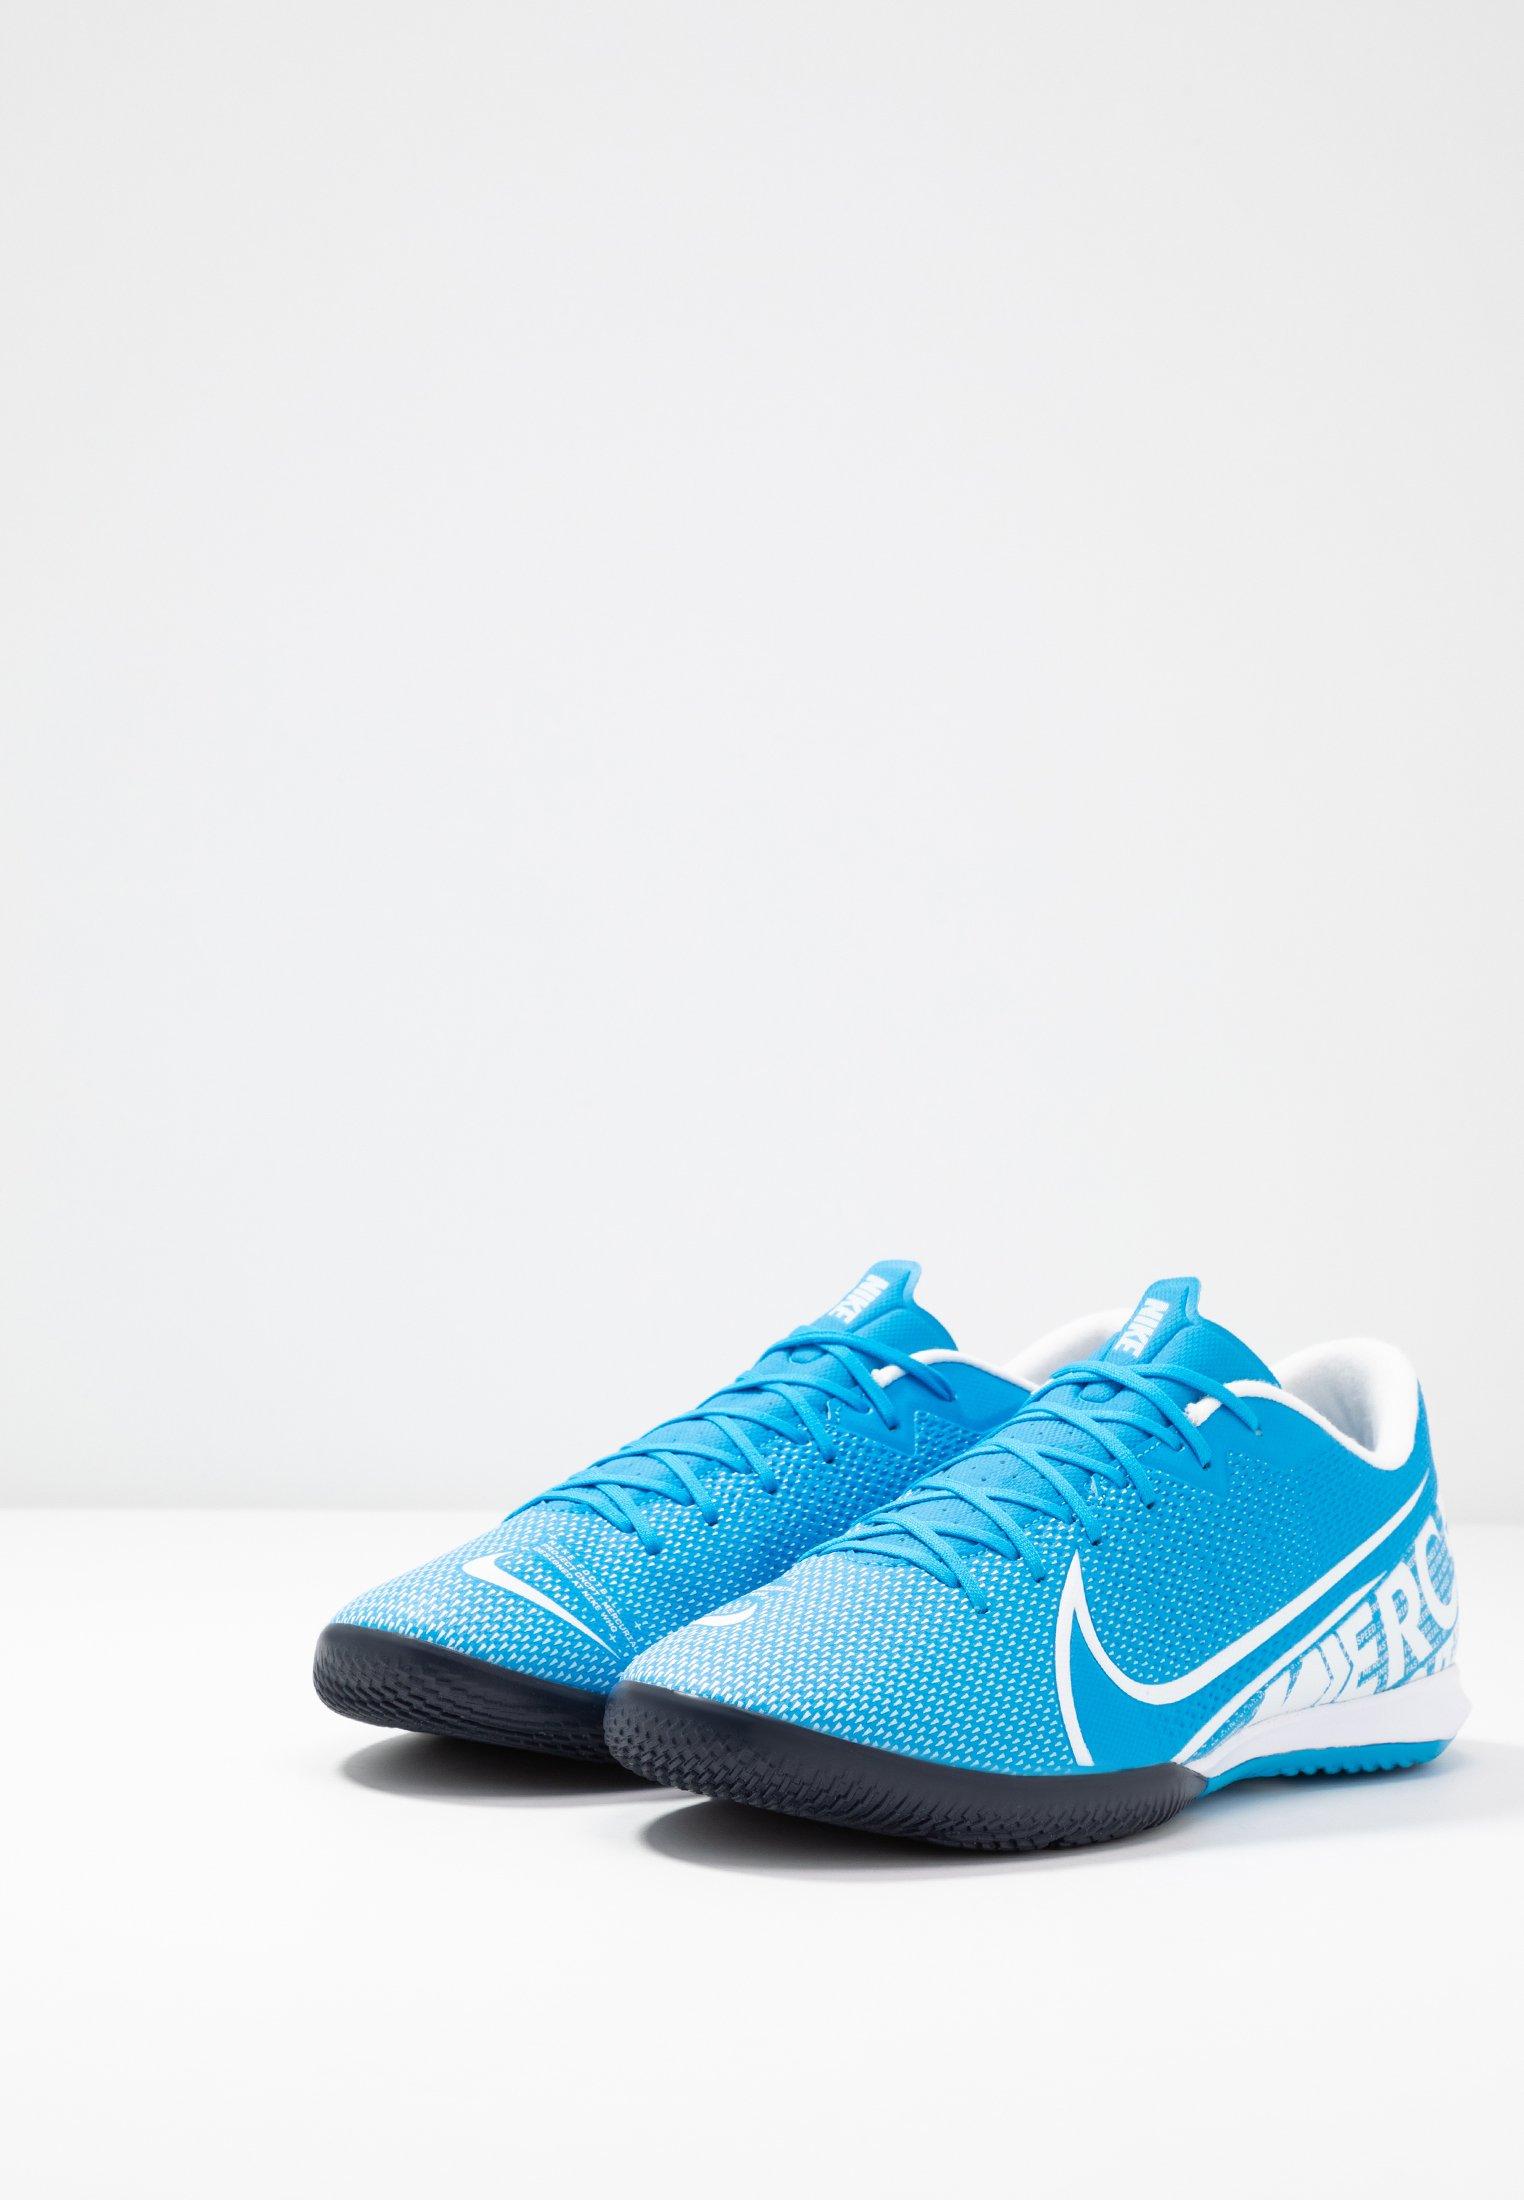 En IcChaussures Foot De Hero Academy Performance obsidian Salle Blue Vapor Nike white 13 8nPkw0OX